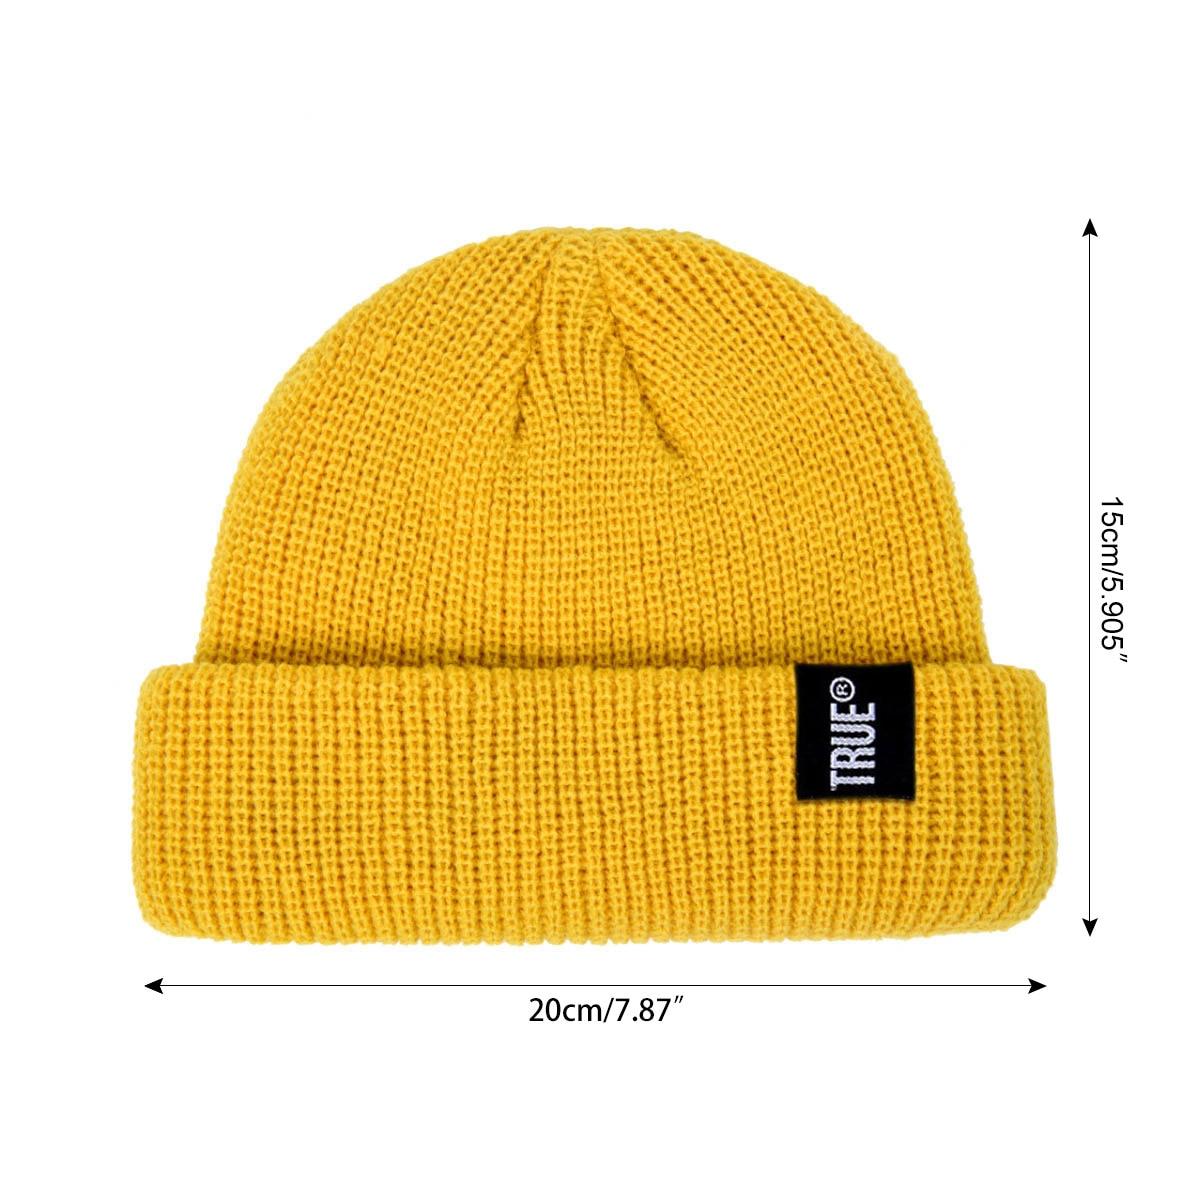 2019 Fashion Unisex Winter Hat Men Cuffed Cib Knit Hat Short Melon Ski Beanies Autumn Winter Solid Color Casual Beanie Hat 14